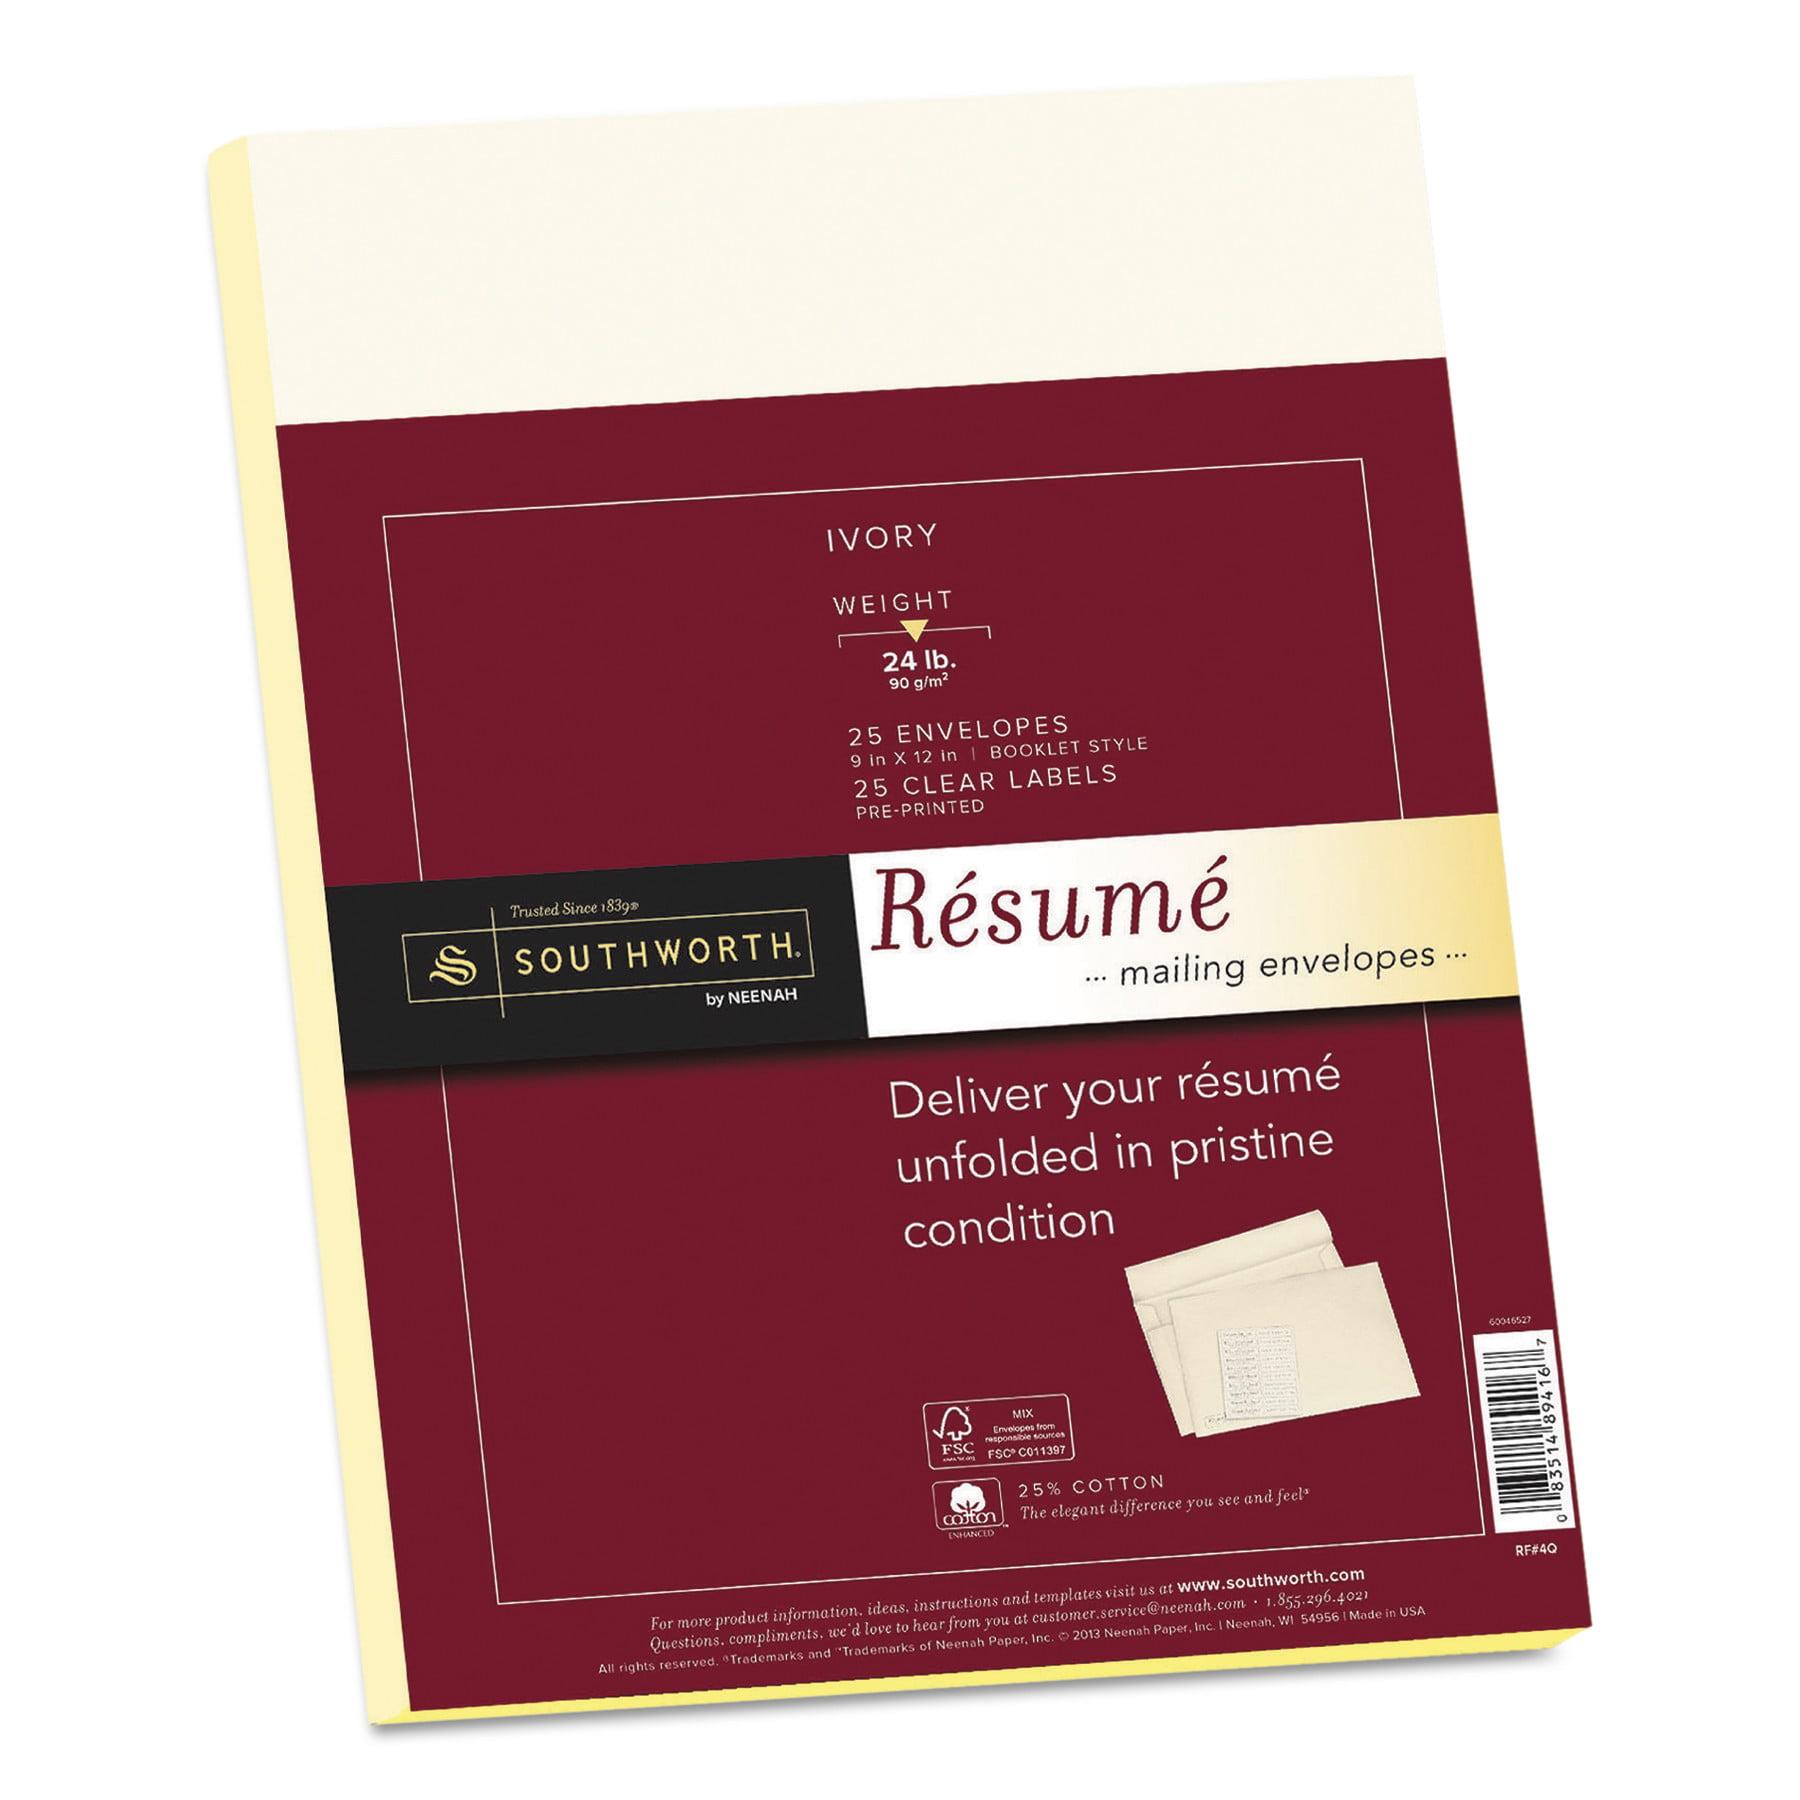 Southworth 25% Cotton Resume Envelopes, Ivory, 24lb, 9 x 12, Wove, 25/Box